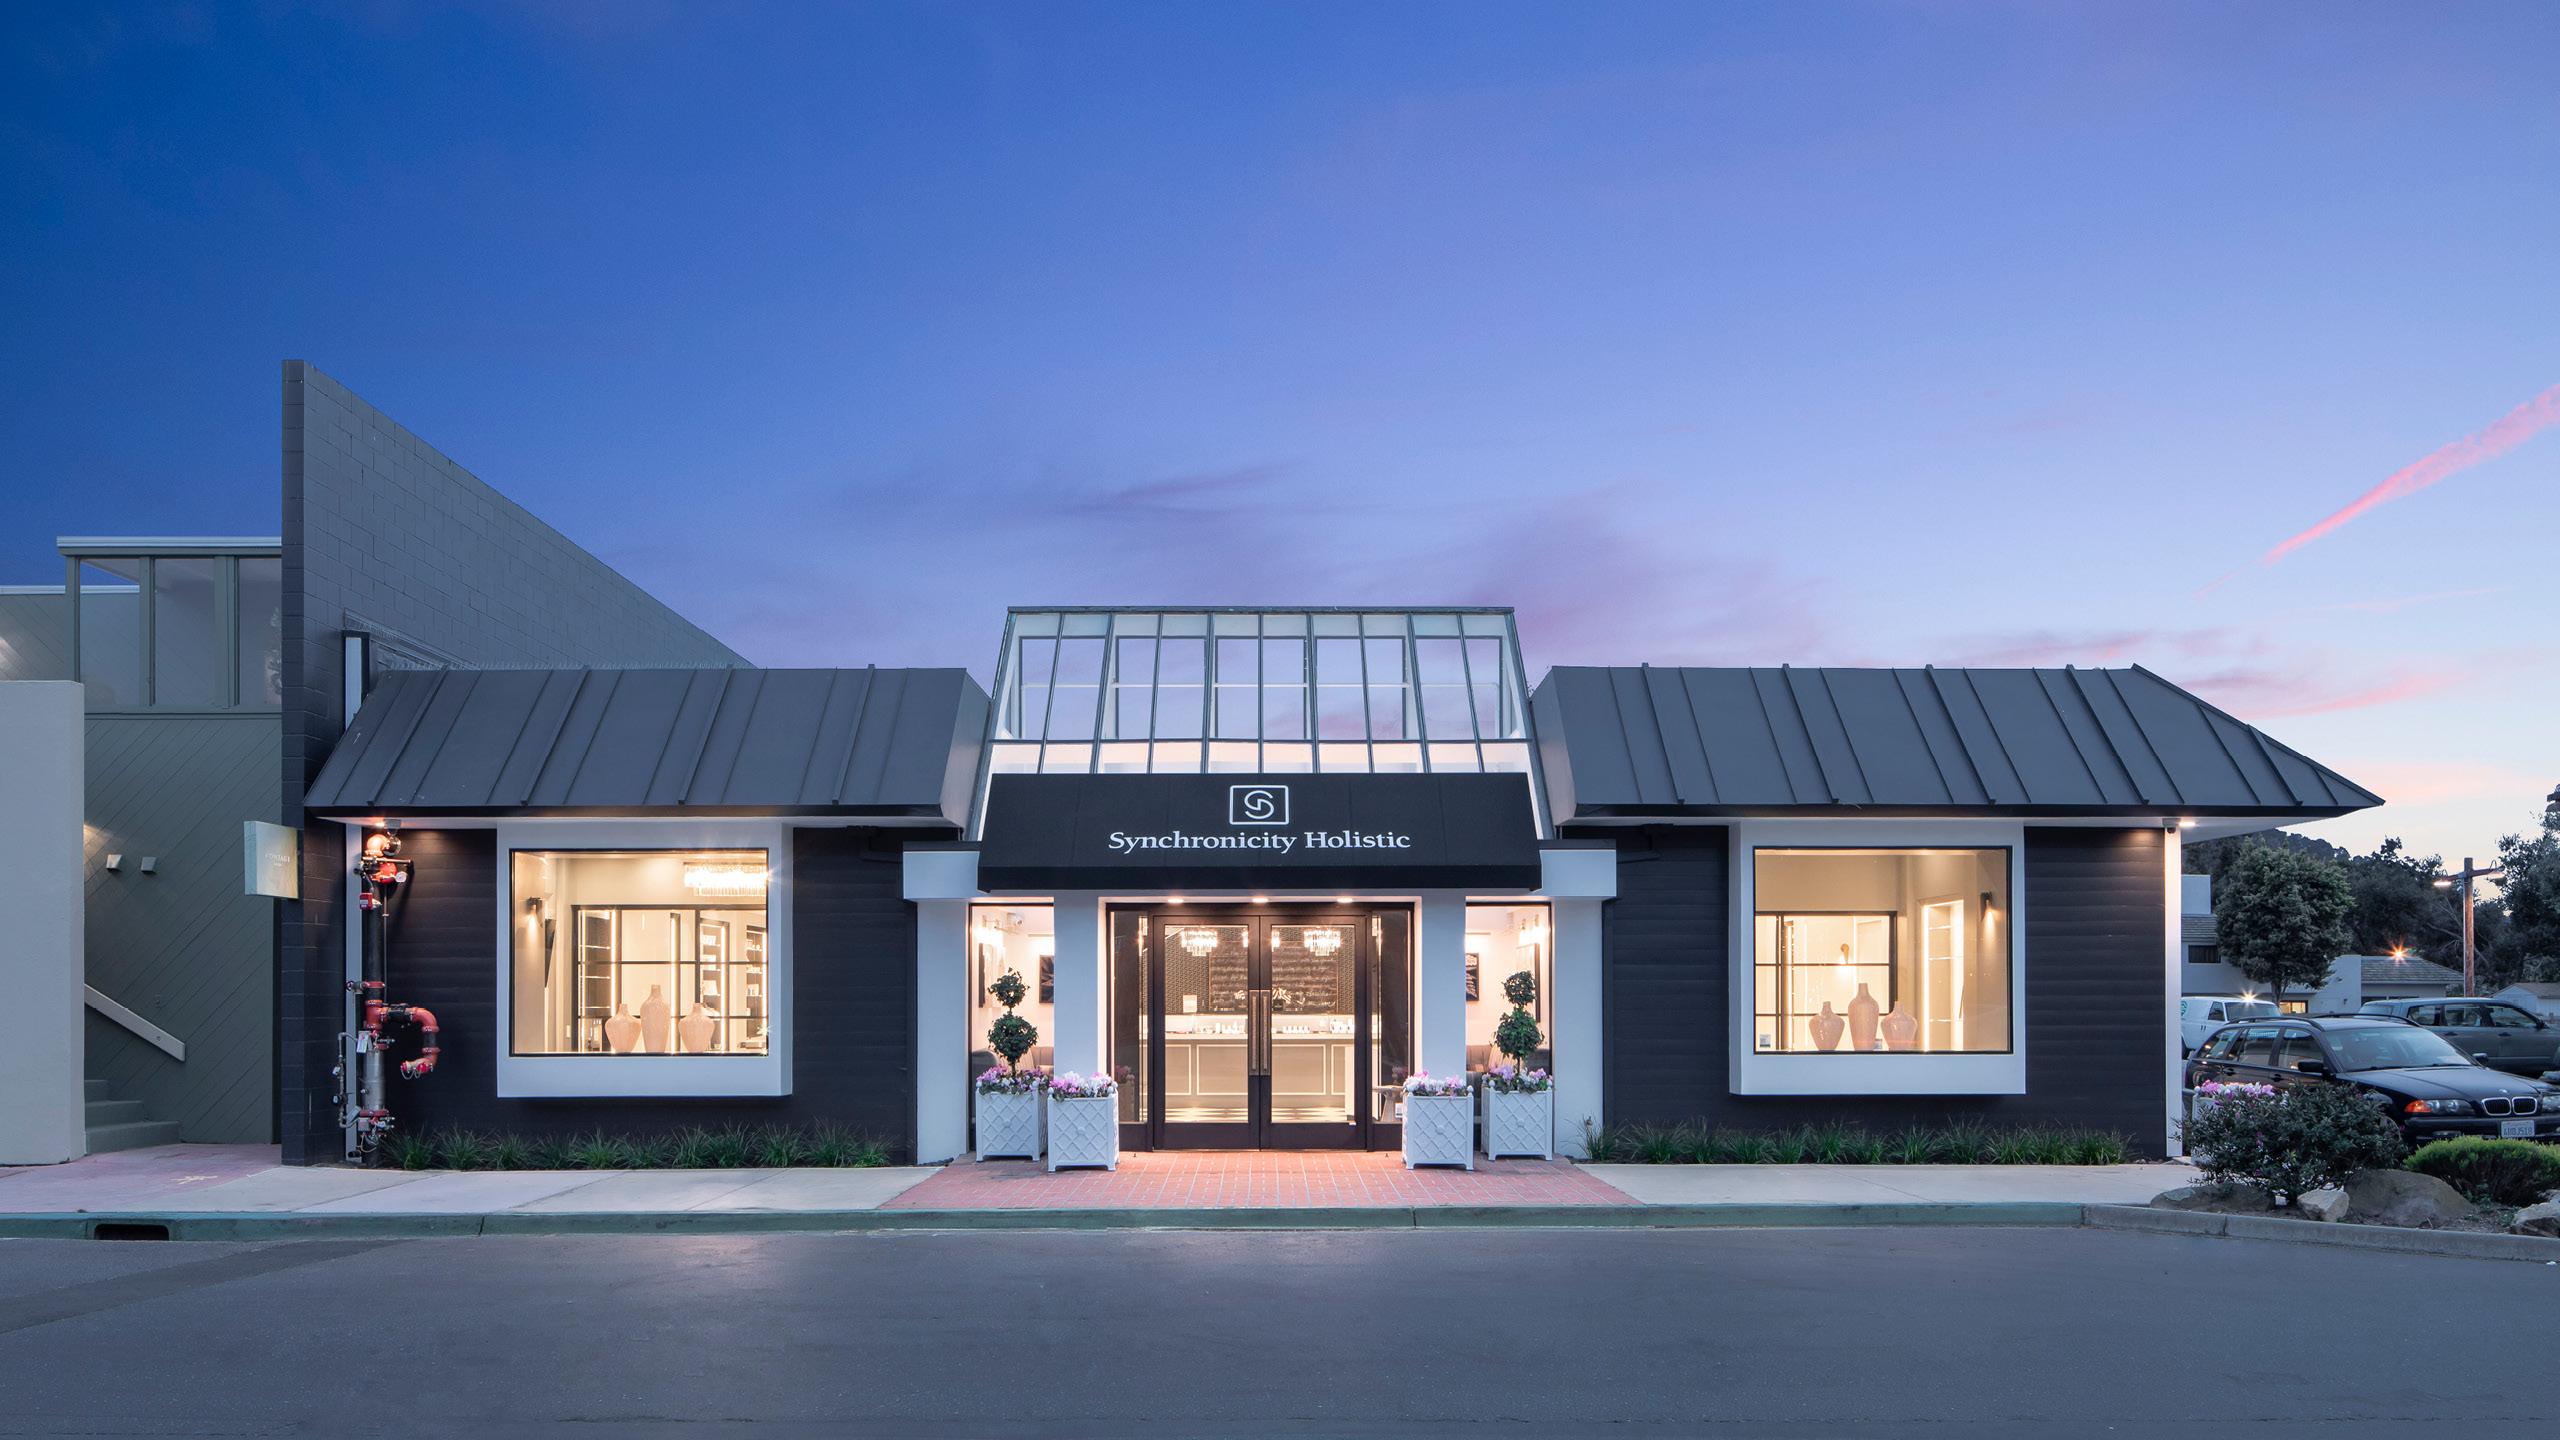 Synchronicity Holistic Retail Dispensary Design by High Road Design Studio